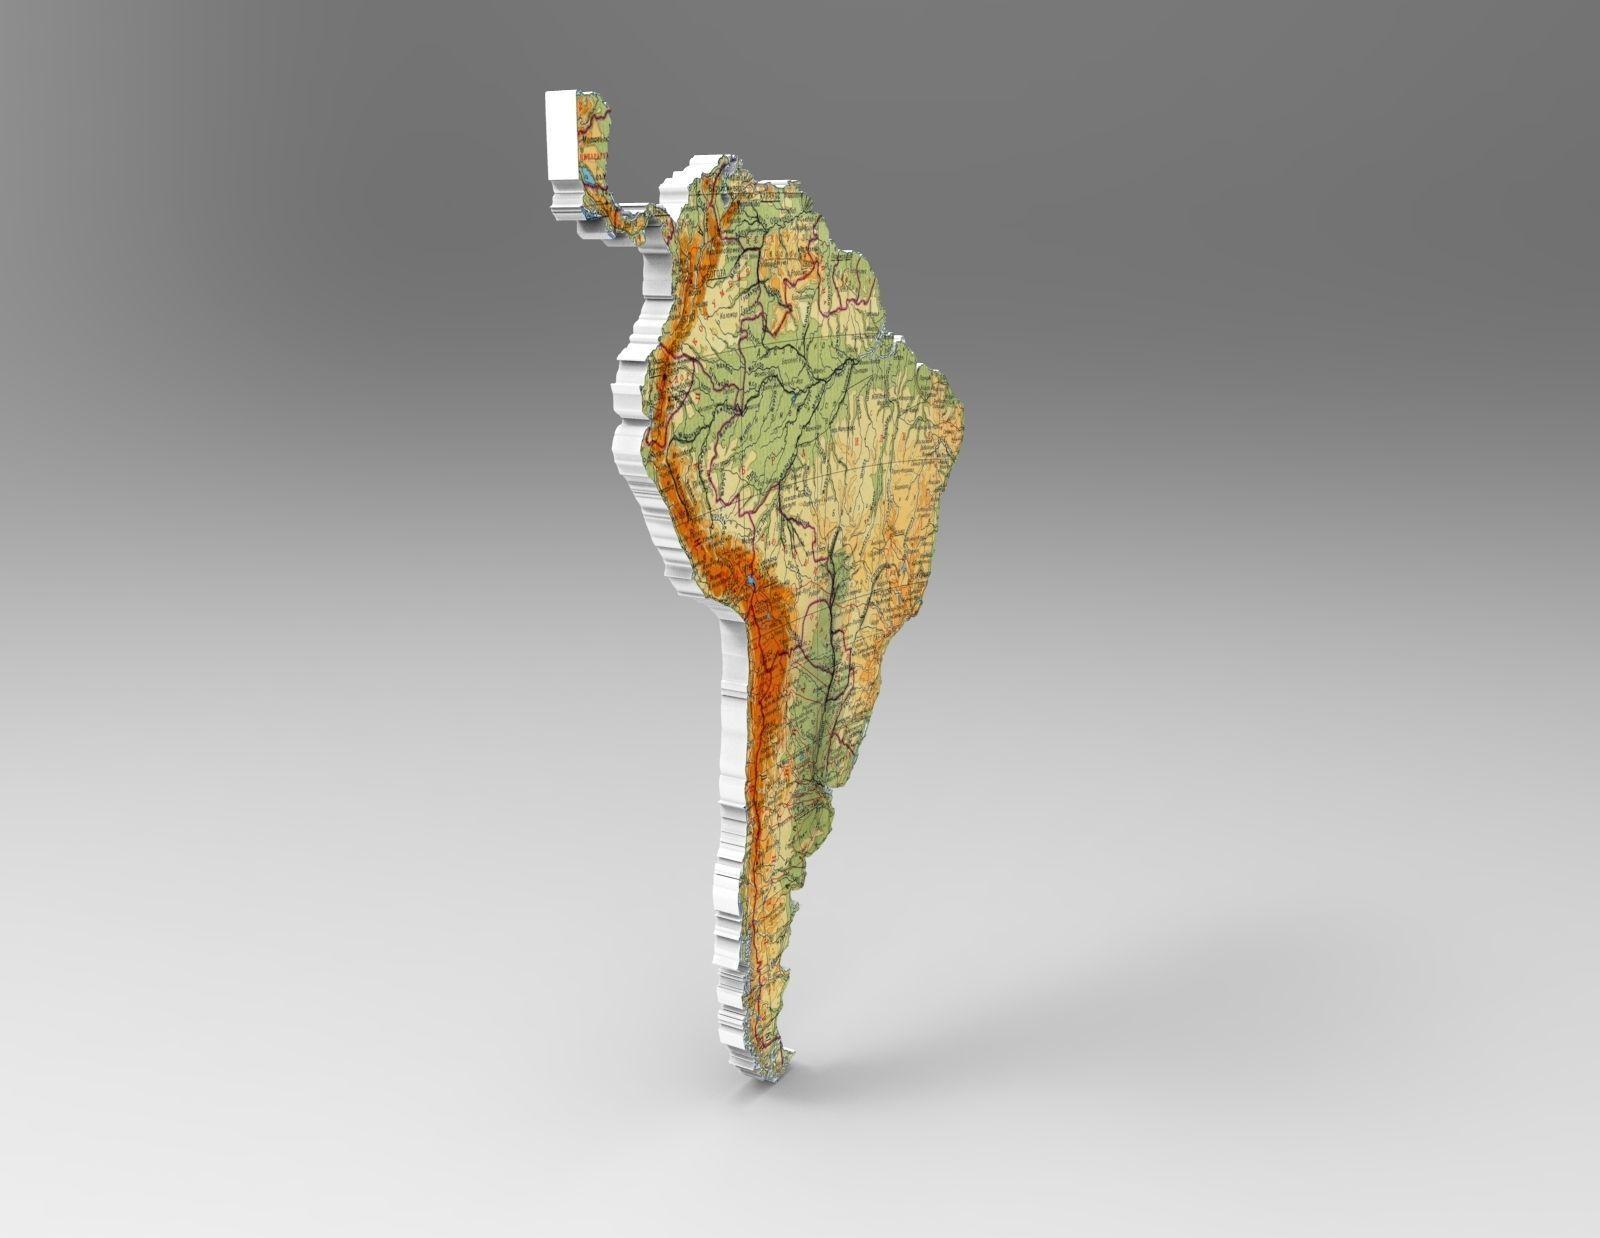 3d Map Of South America.Map Of South America 3d Model